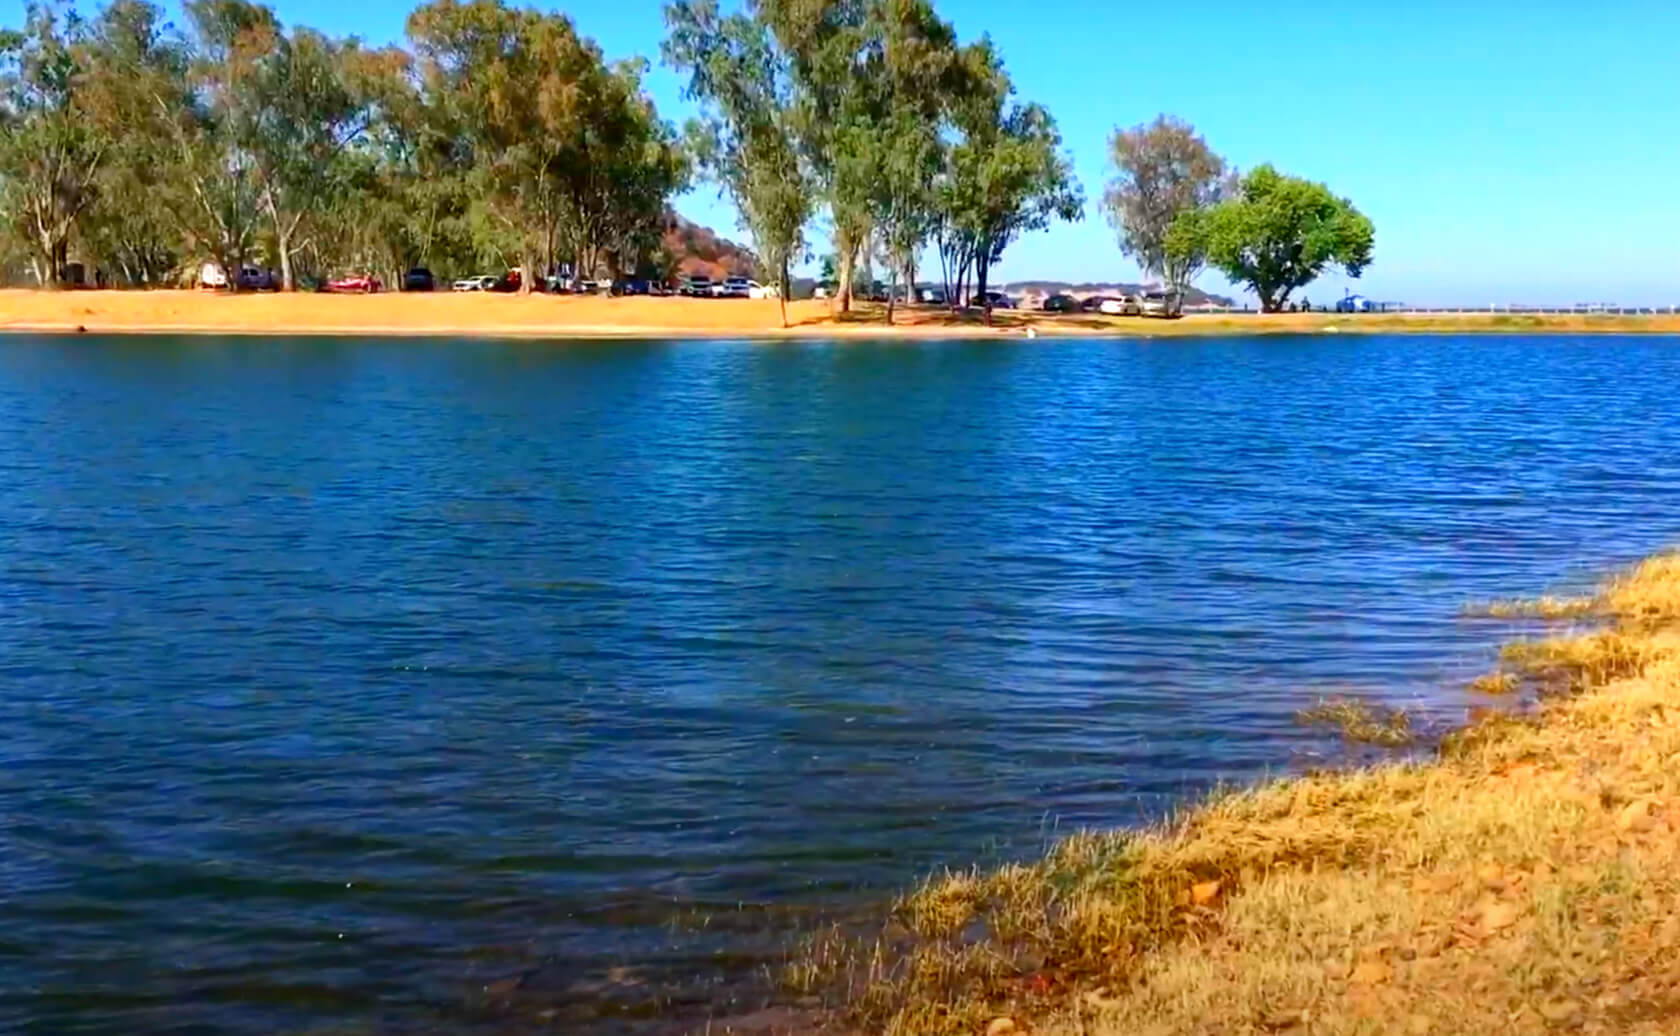 Camanche-Lake-Reservoir-Fishing-Guide-Report-California-05